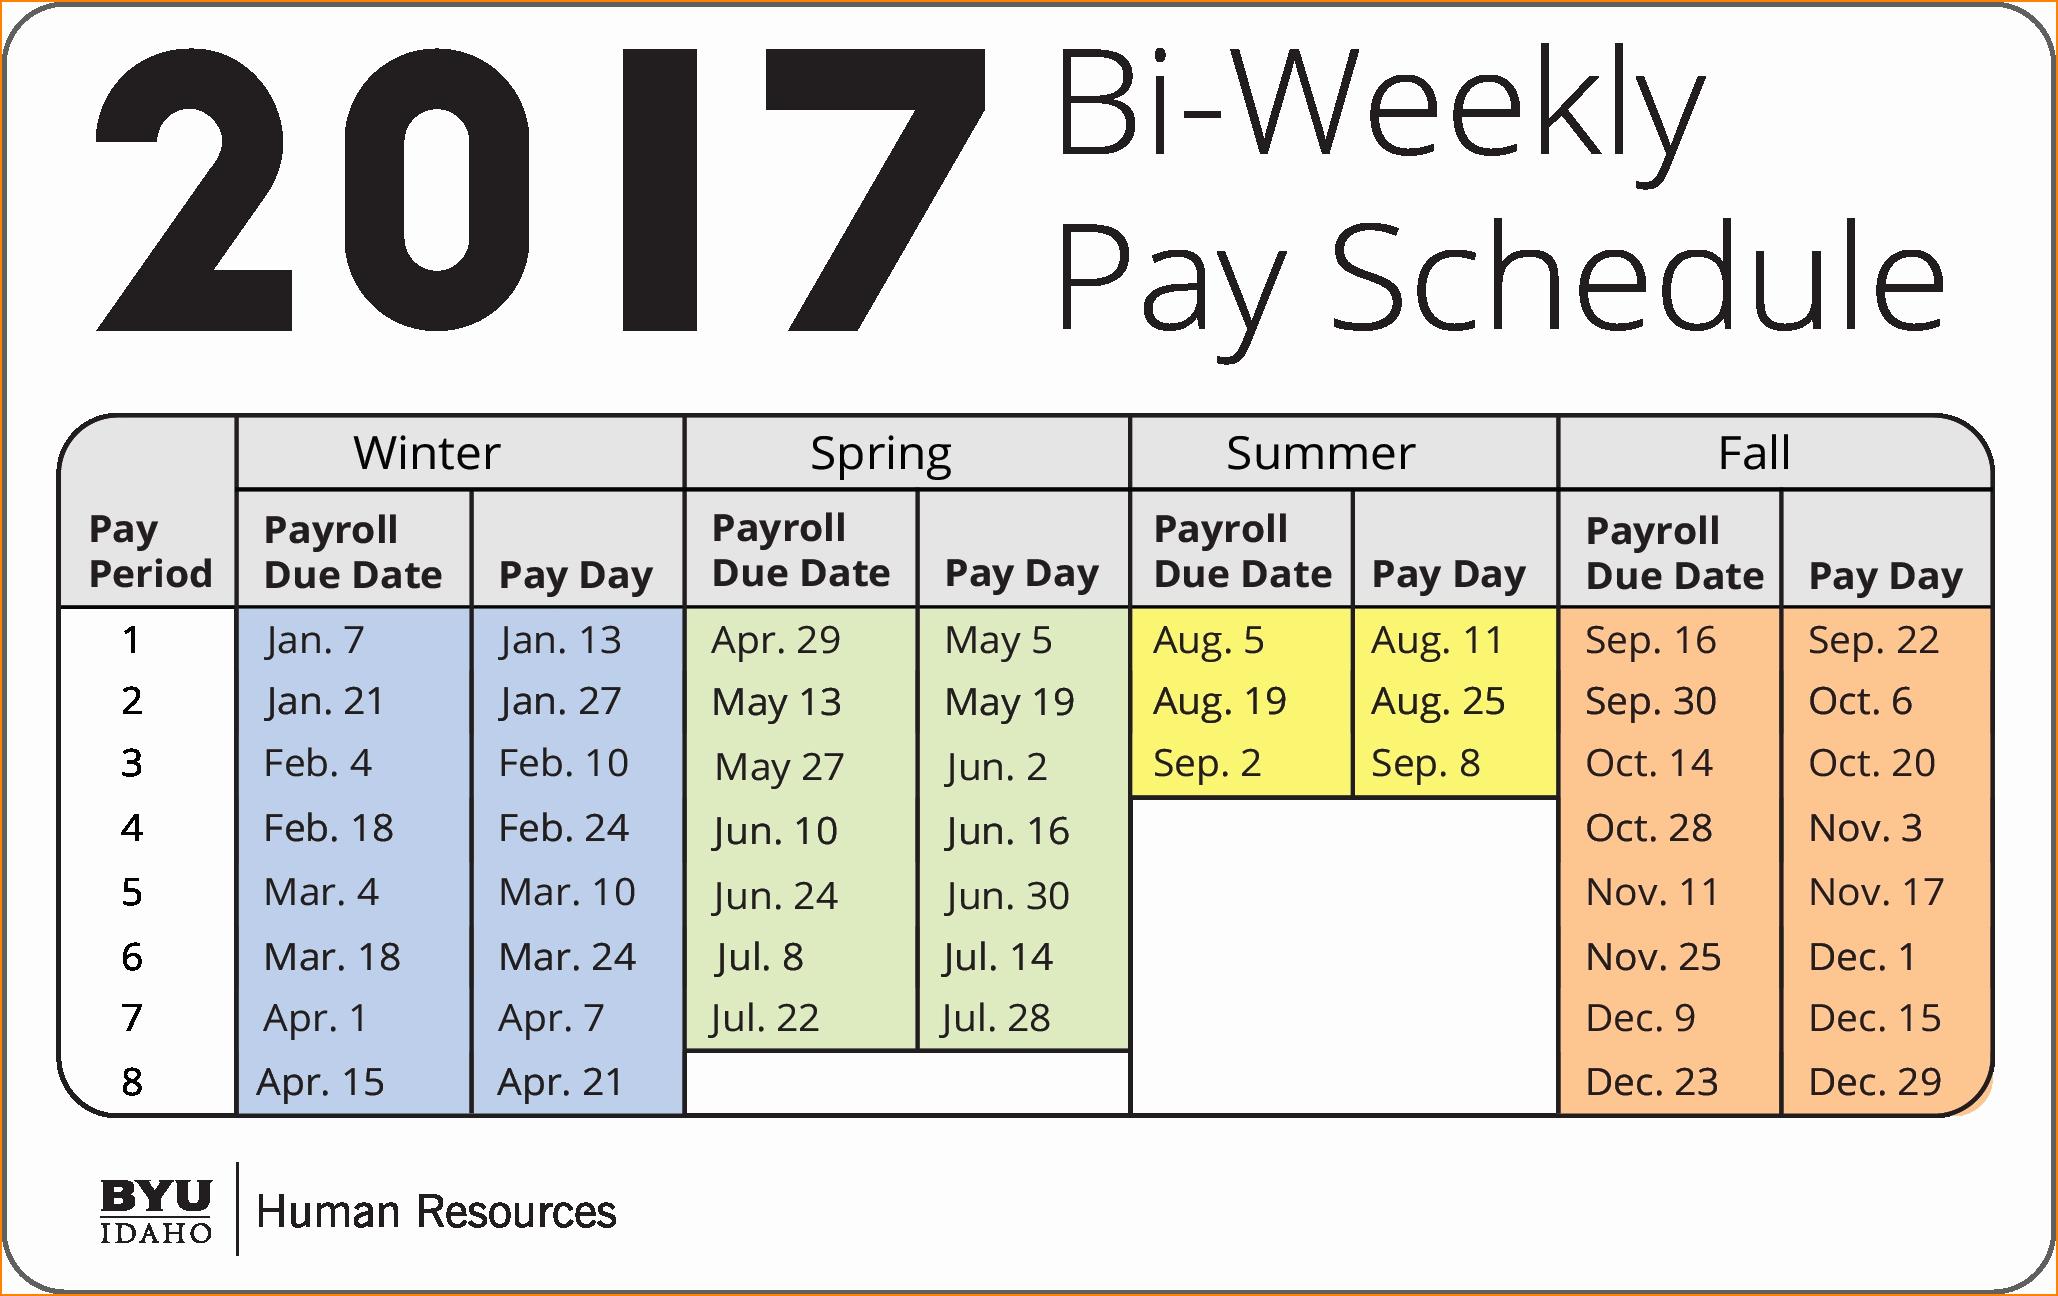 Biweekly Payroll Calendar Template 2017 Luxury 10 Biweekly Payroll Calendar Template 2017